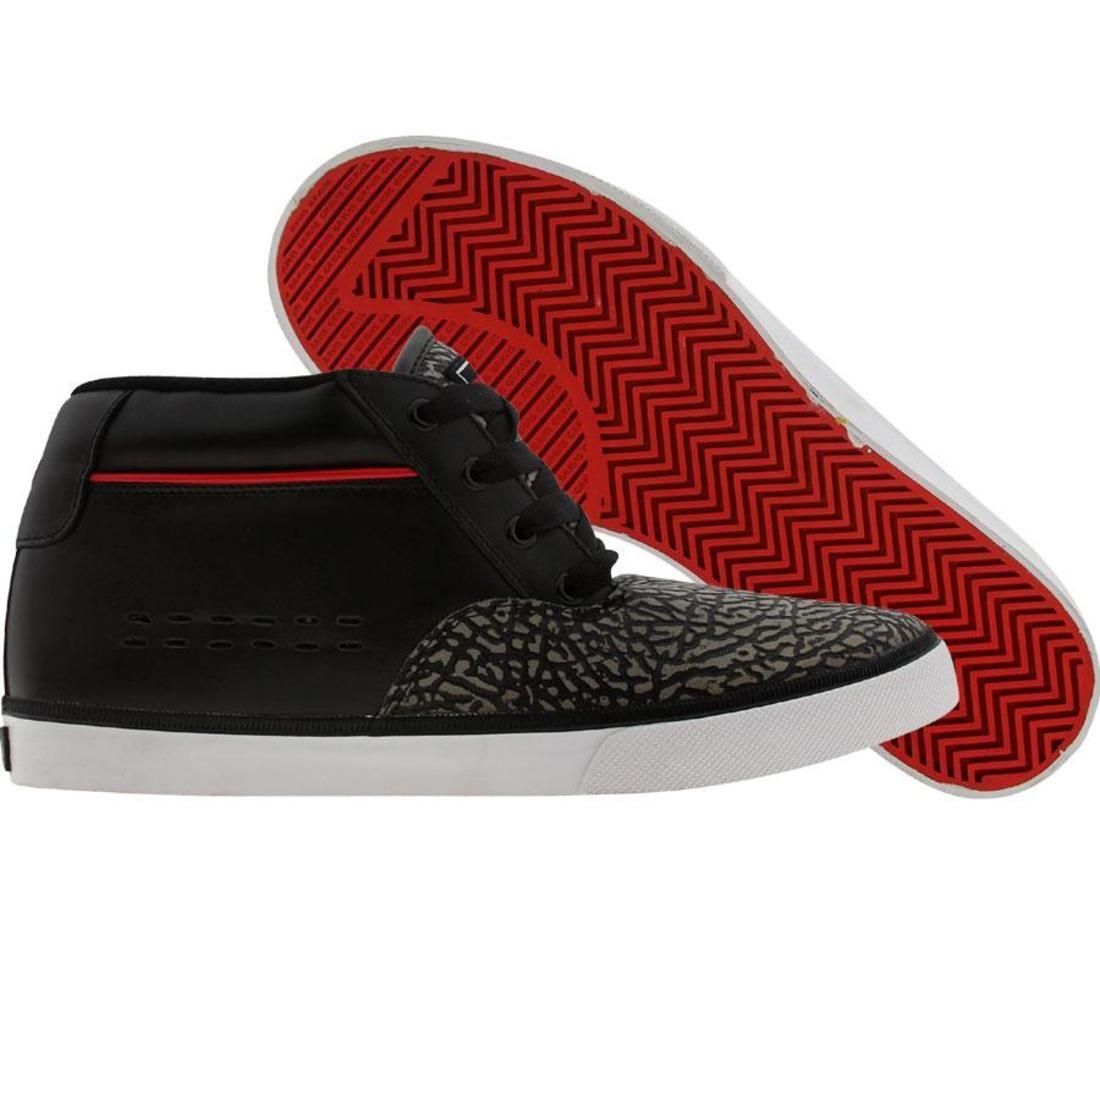 【海外限定】メンズ靴 靴 【 GRAVIS CHUCK LX BLACK ELEPHANT 】